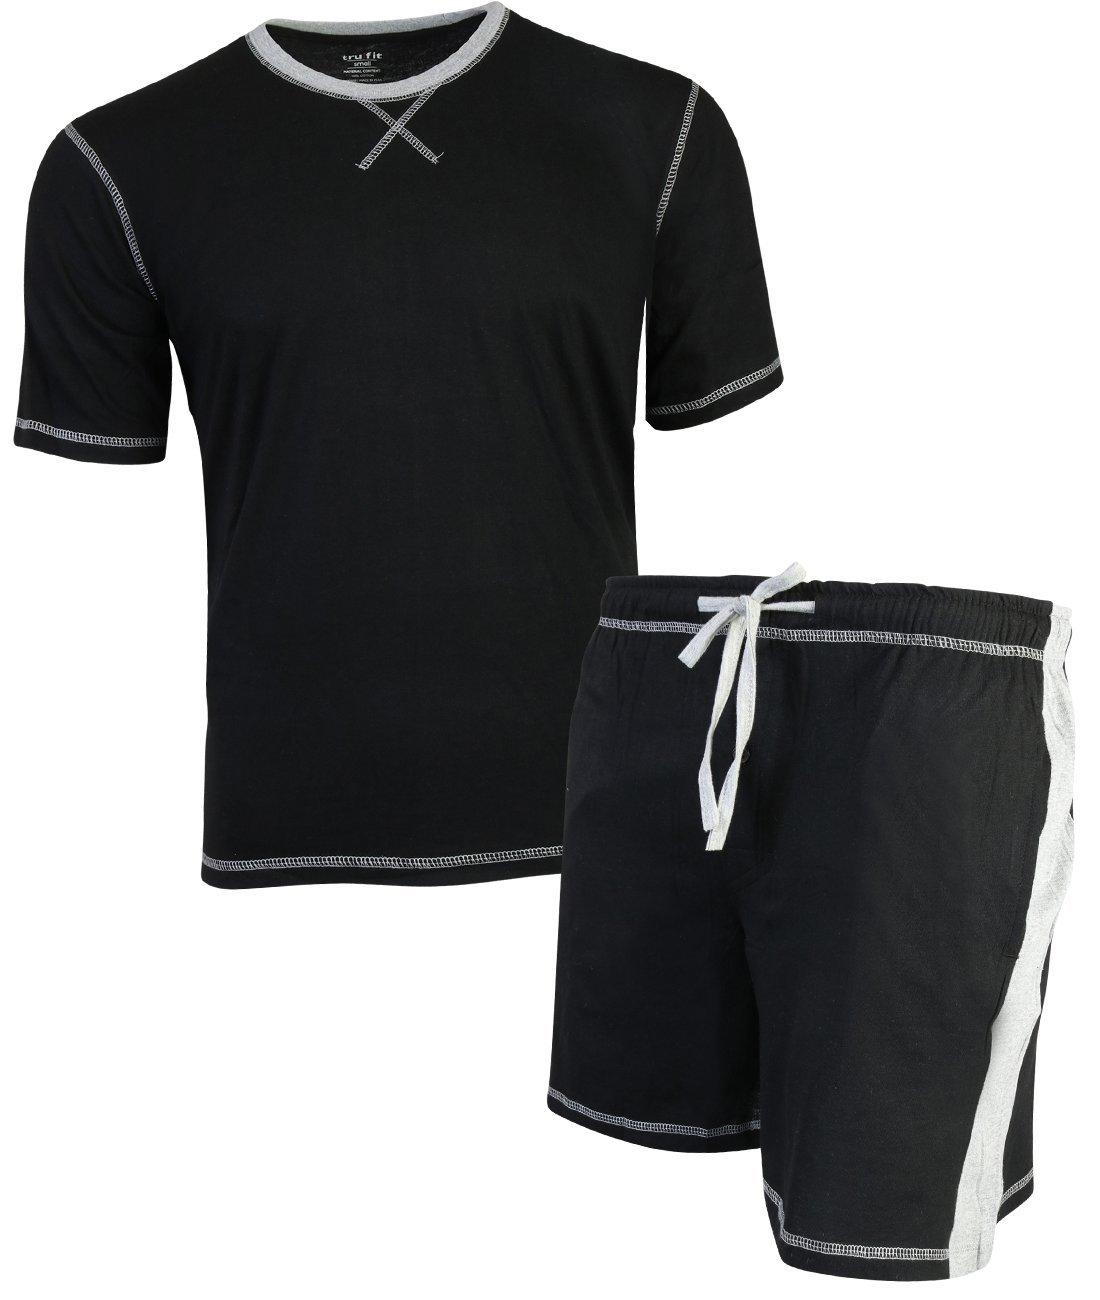 TruFit Men's 2-Piece Summer Short Sleeve Shirt and Shorts Pajama Set, Black, X-Large'